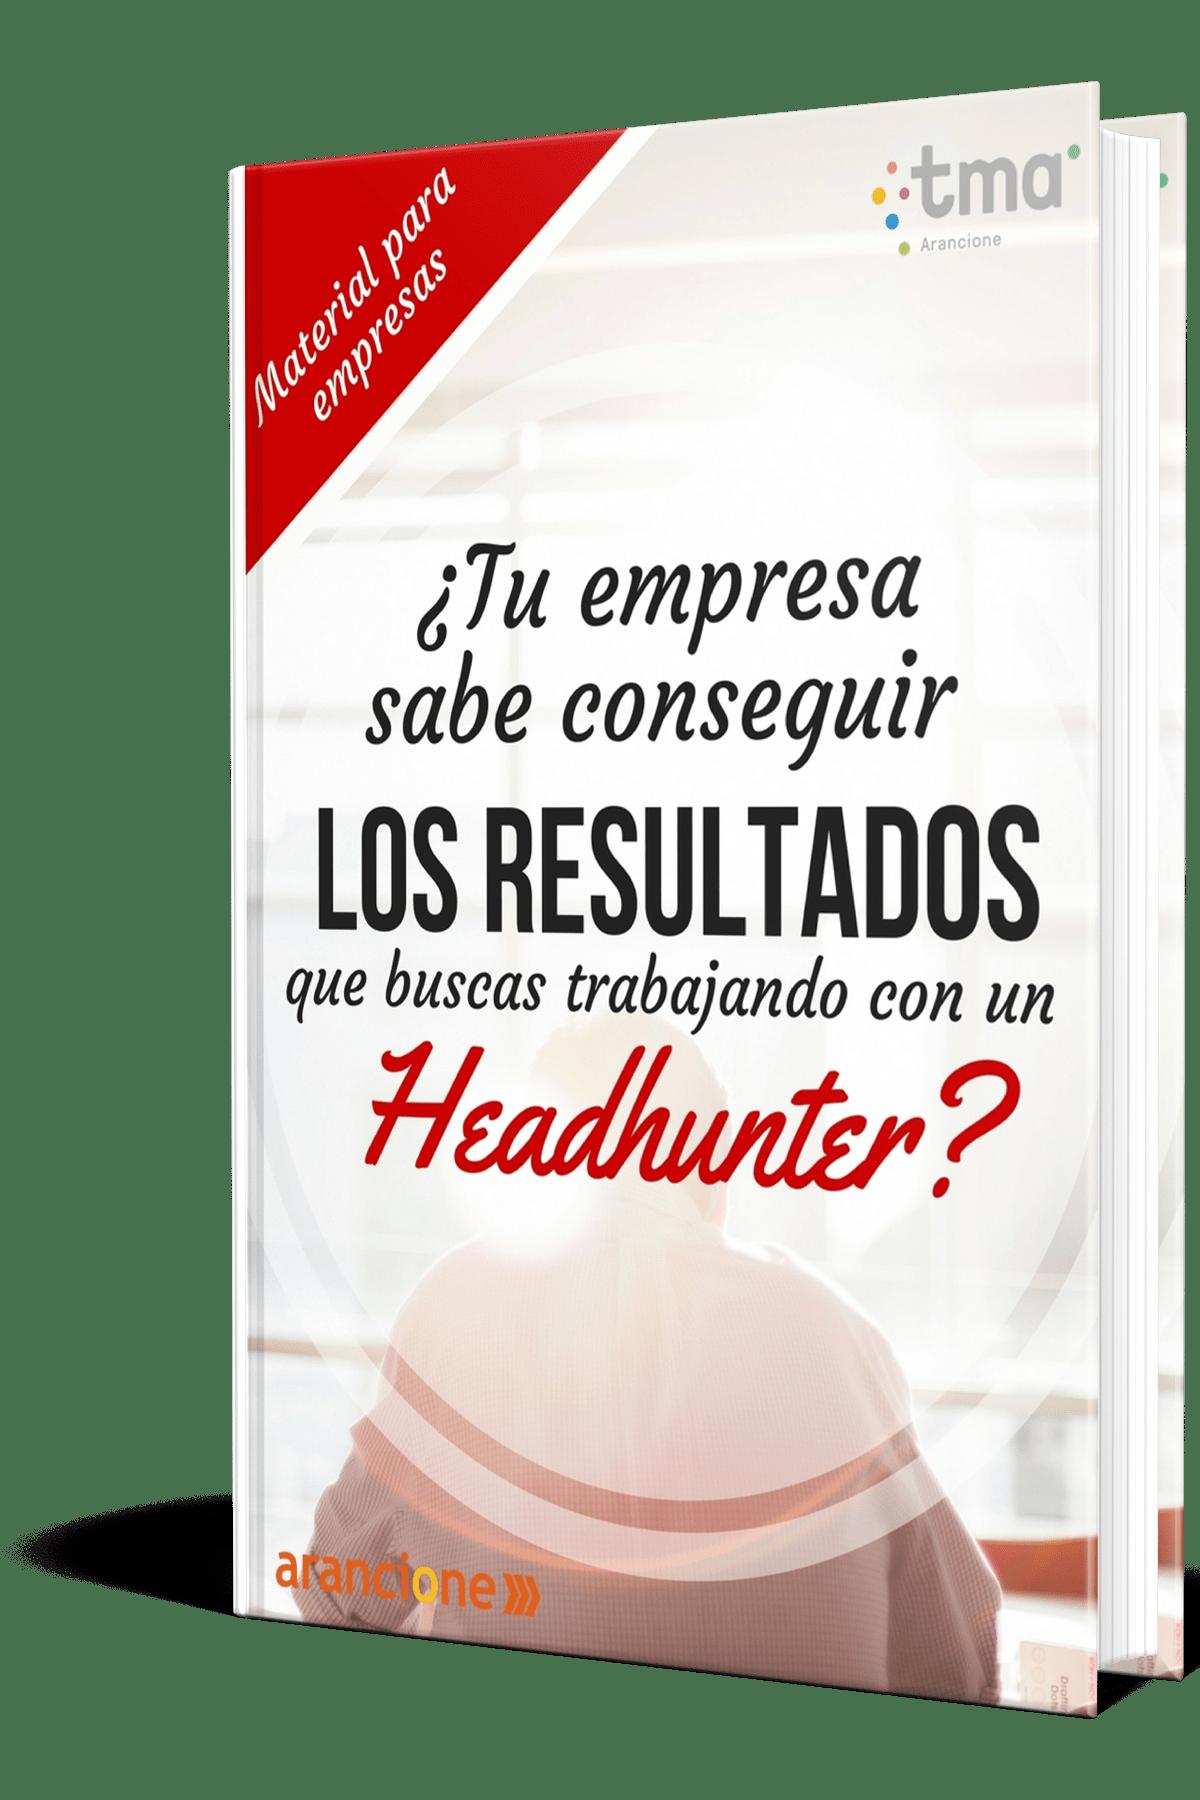 hardbackstanding2left_1200x1800-min.png